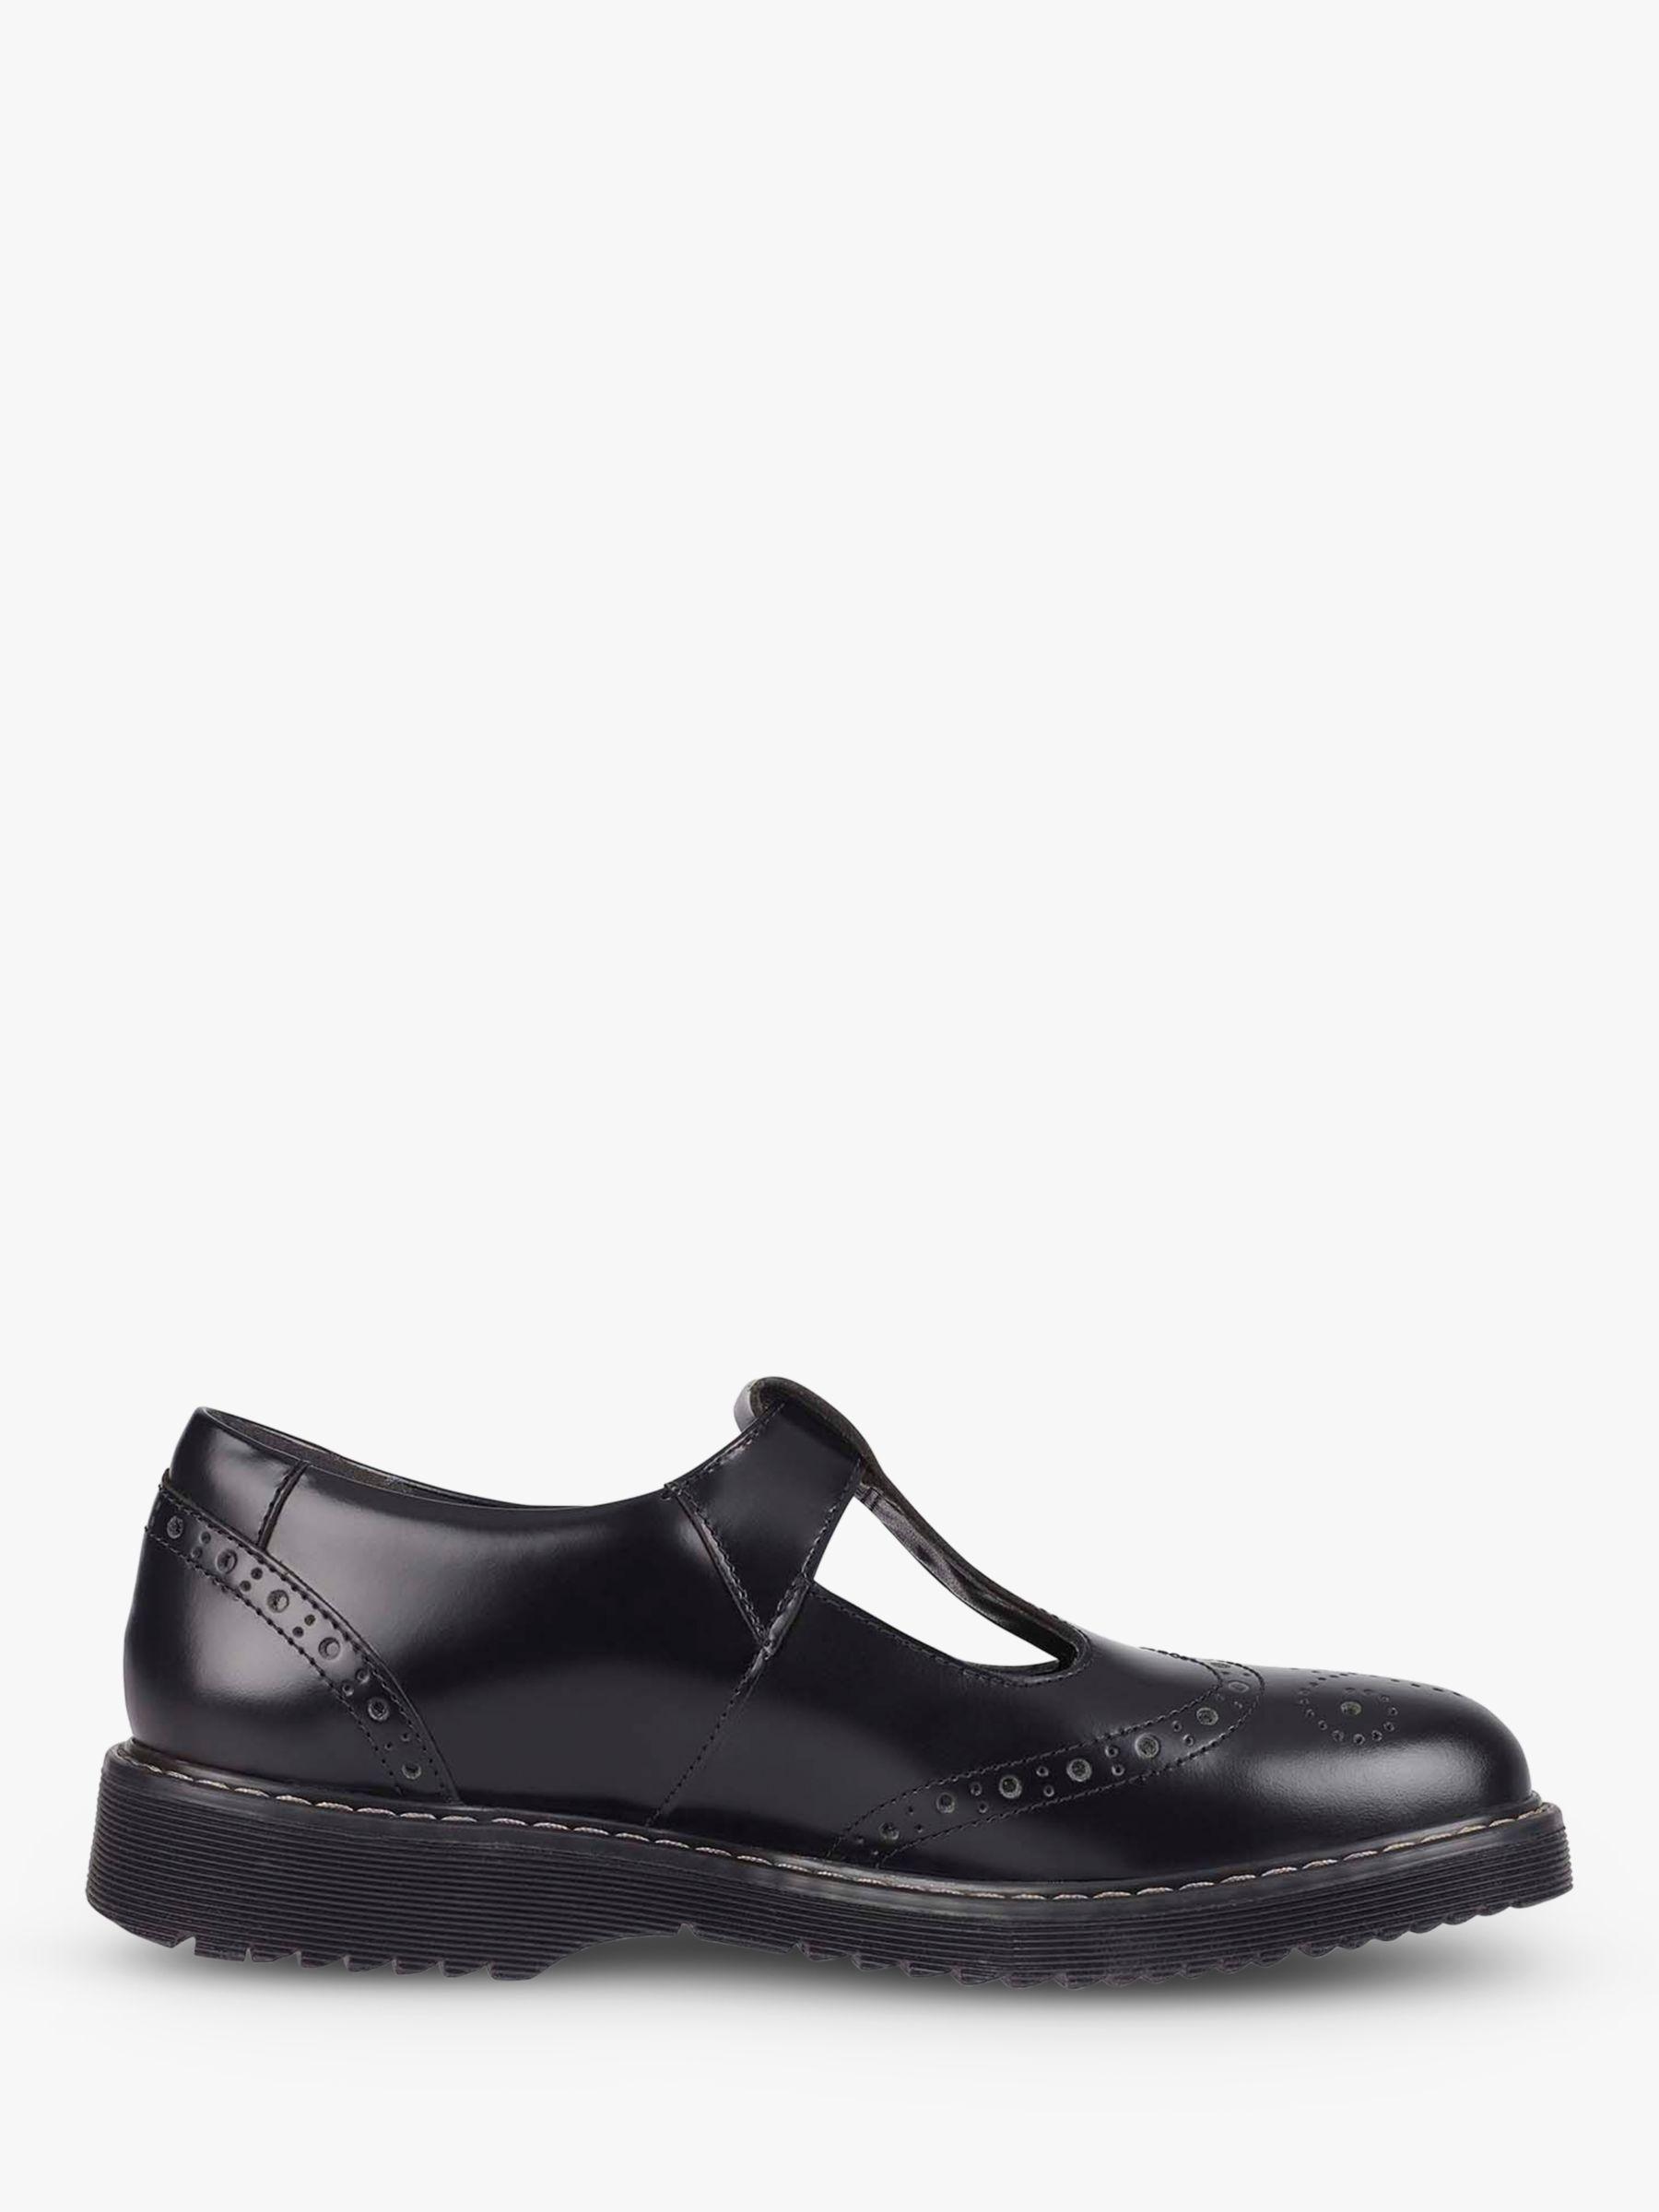 Start-Rite Start-rite Children's Imagine Leather Shoes, Black